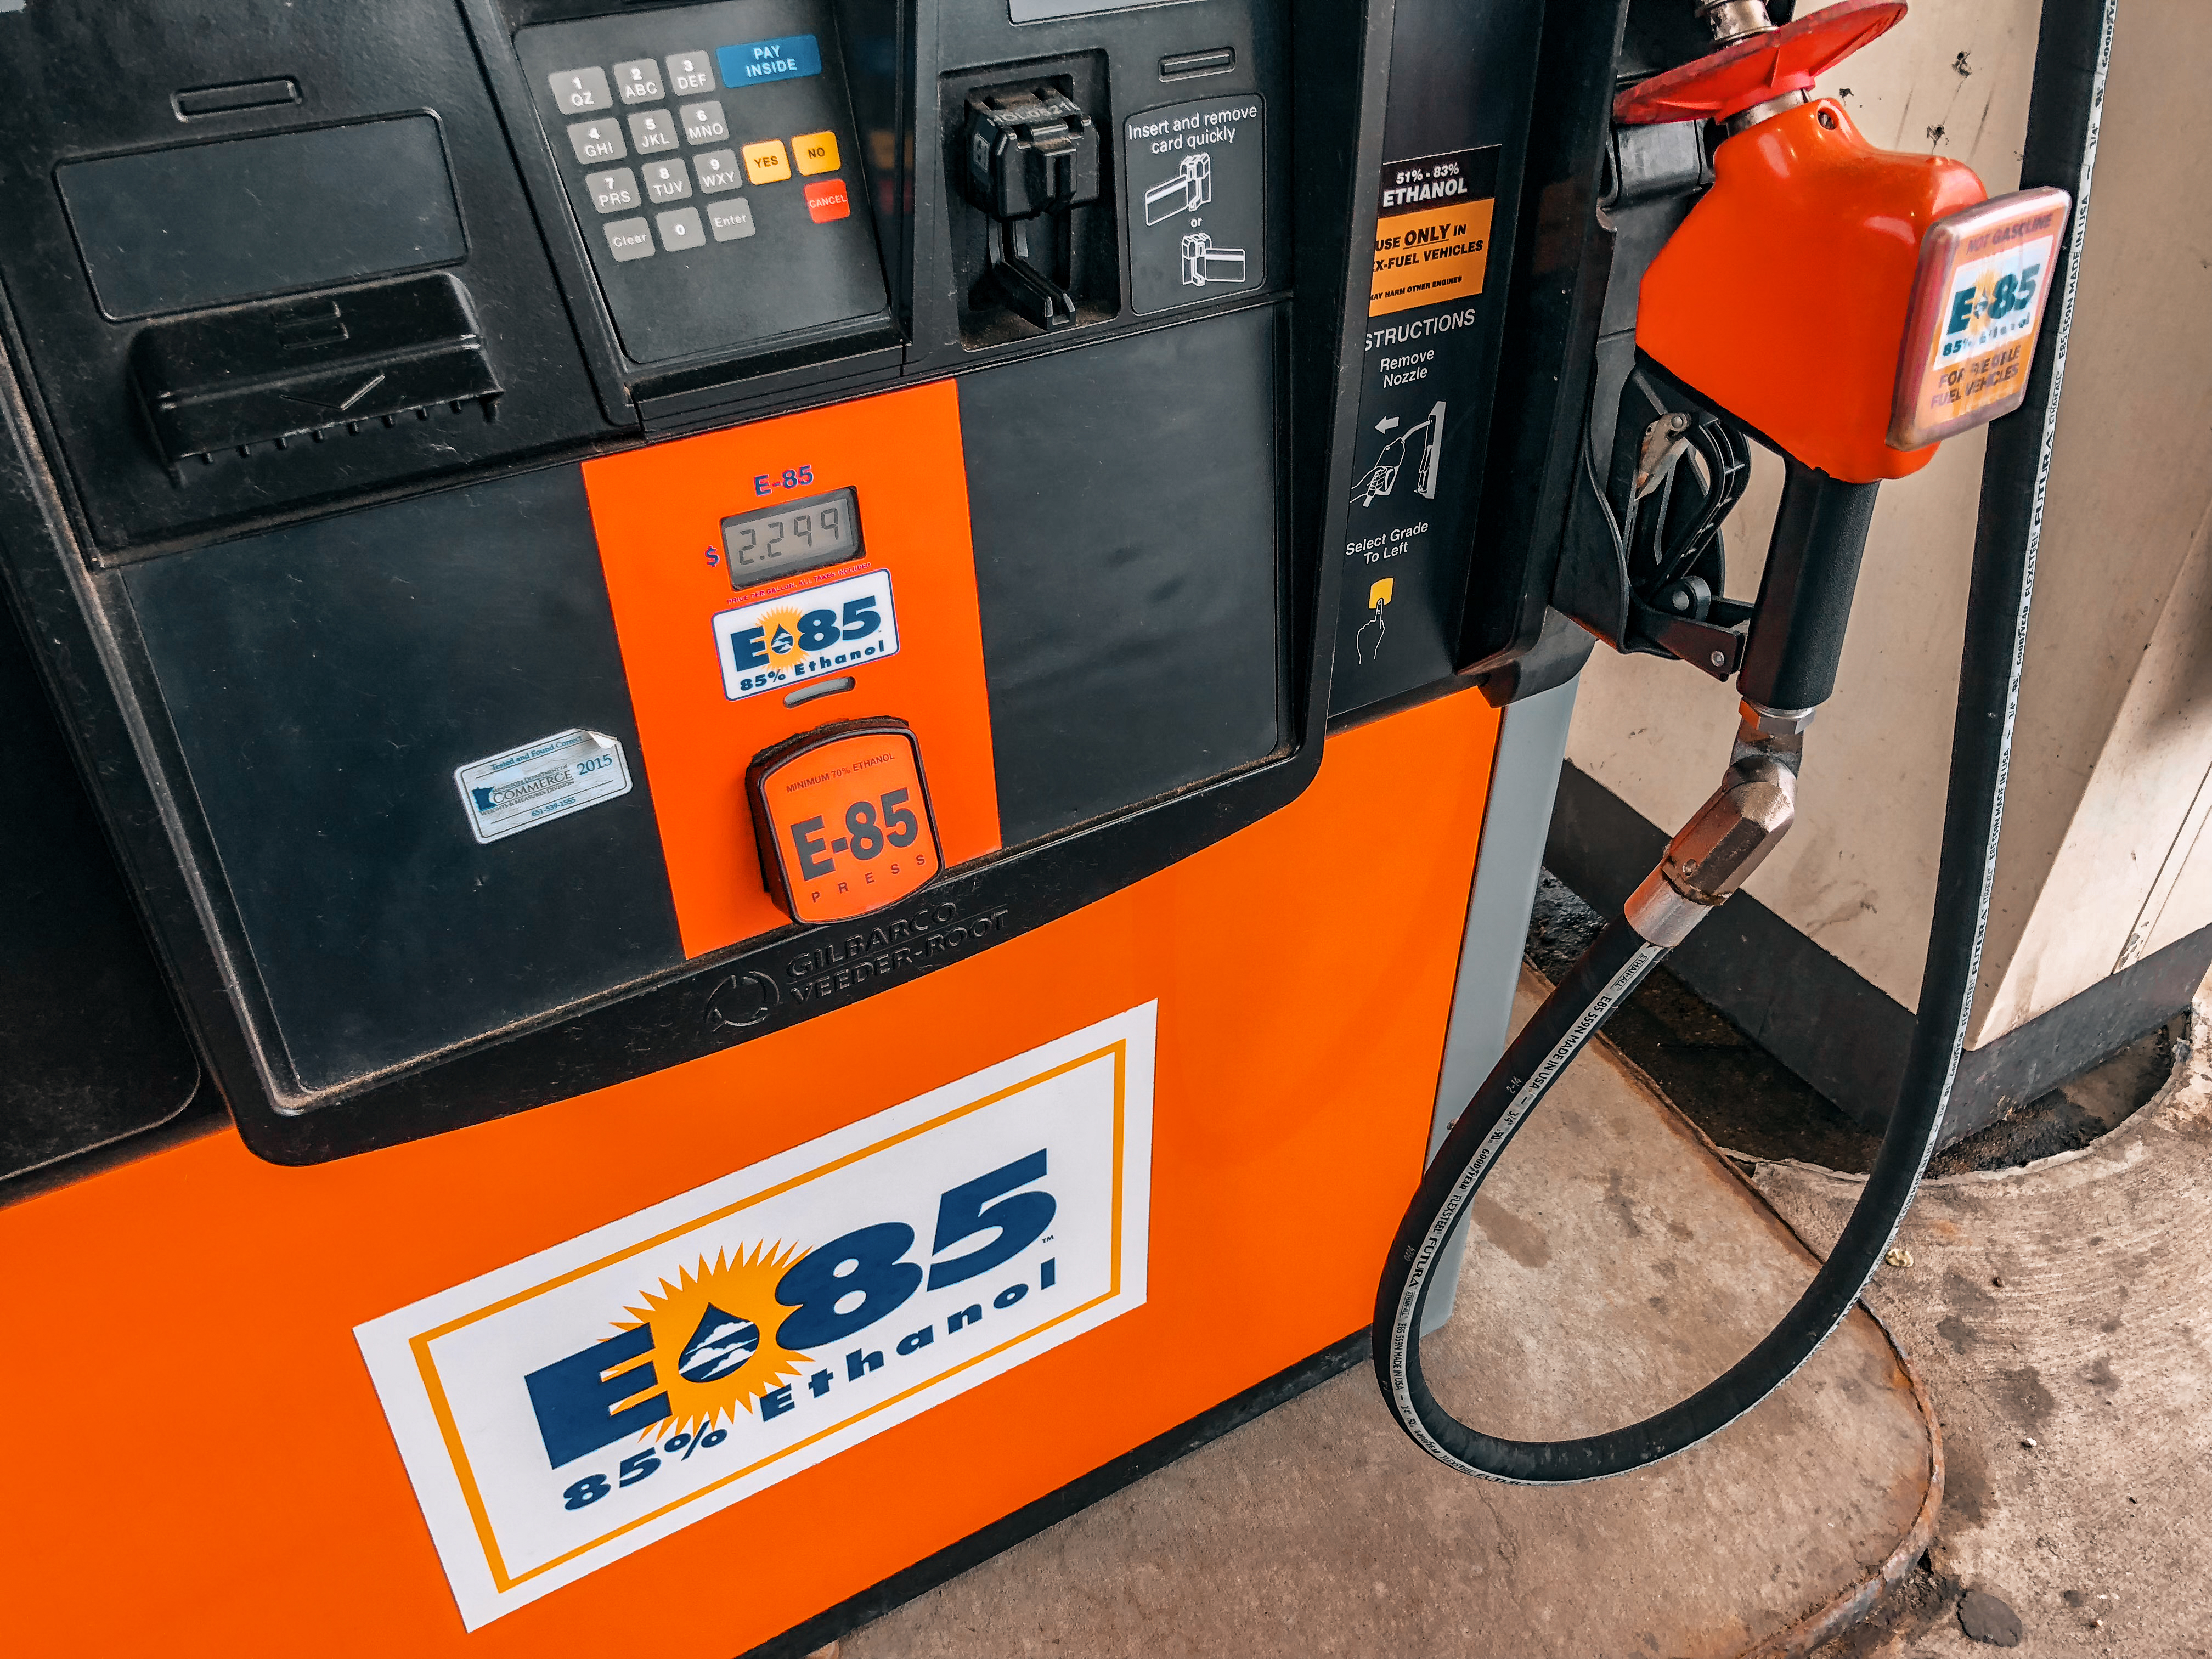 File:E-85 (85% Ethanol) Gas Station Pump for Flex-Fuel E85 Vehicles (28822296738).jpg - Wikimedia Commons